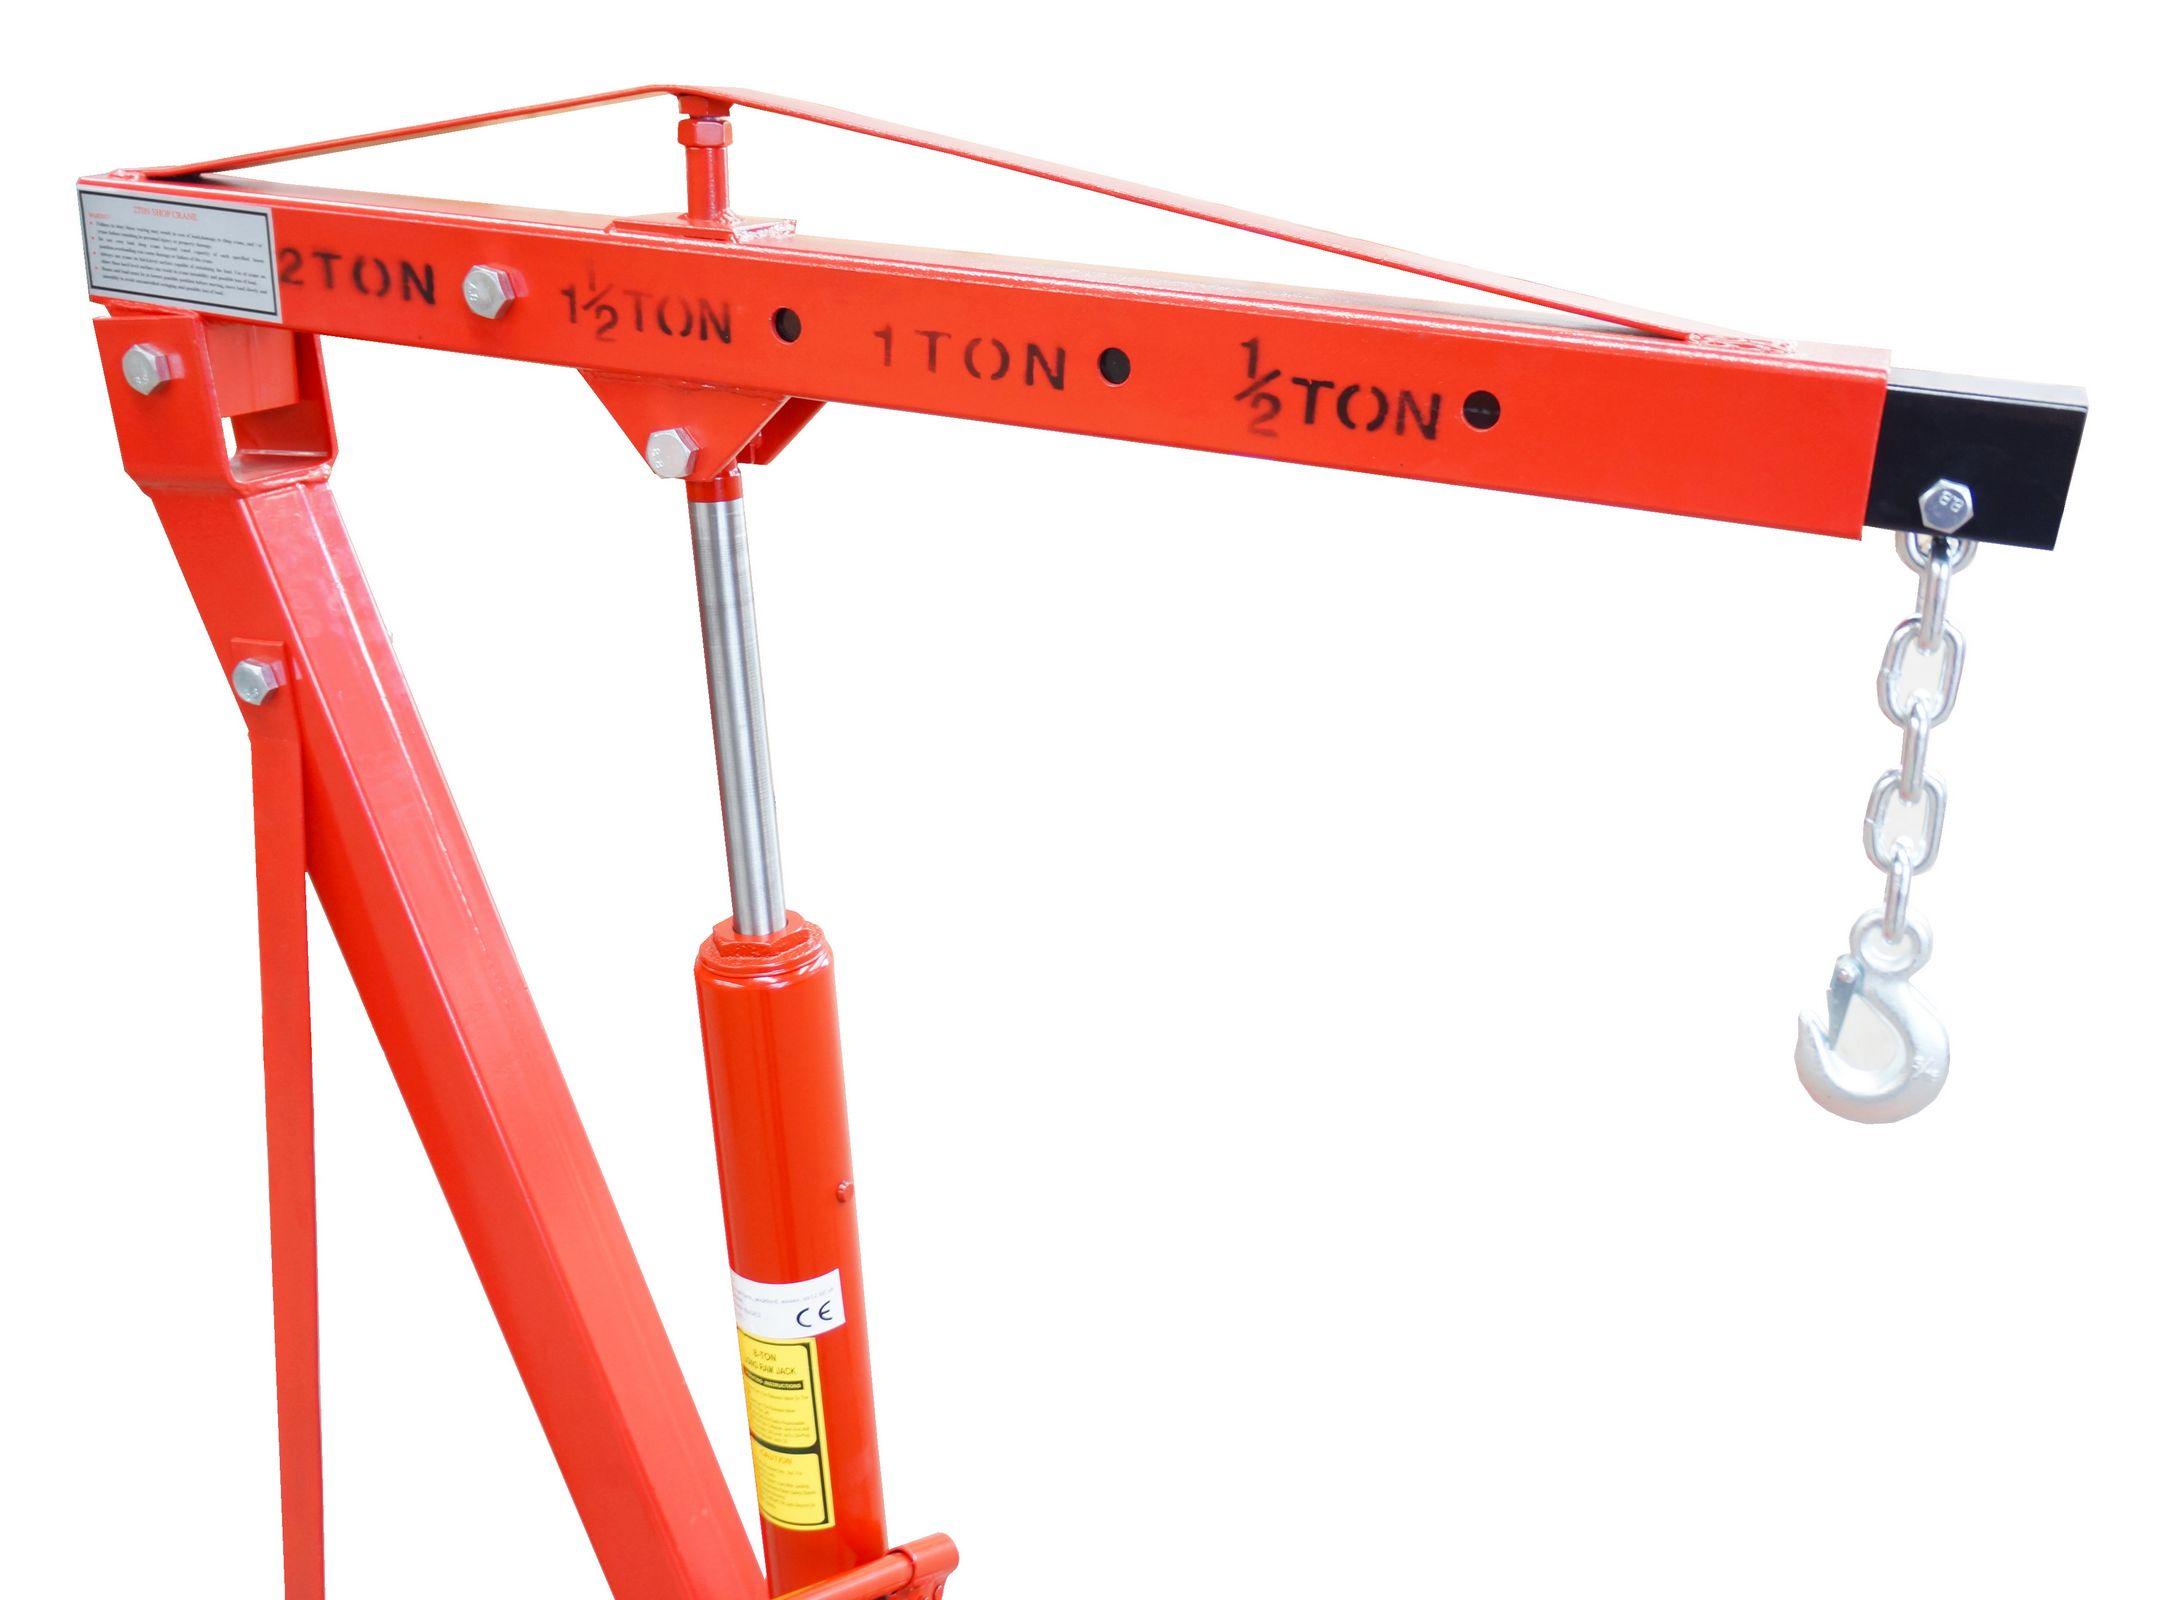 Folding Jack Stands >> FoxHunter Red 2 Ton Hydraulic Folding Engine Crane Stand Hoist lift Jack Wheel | eBay